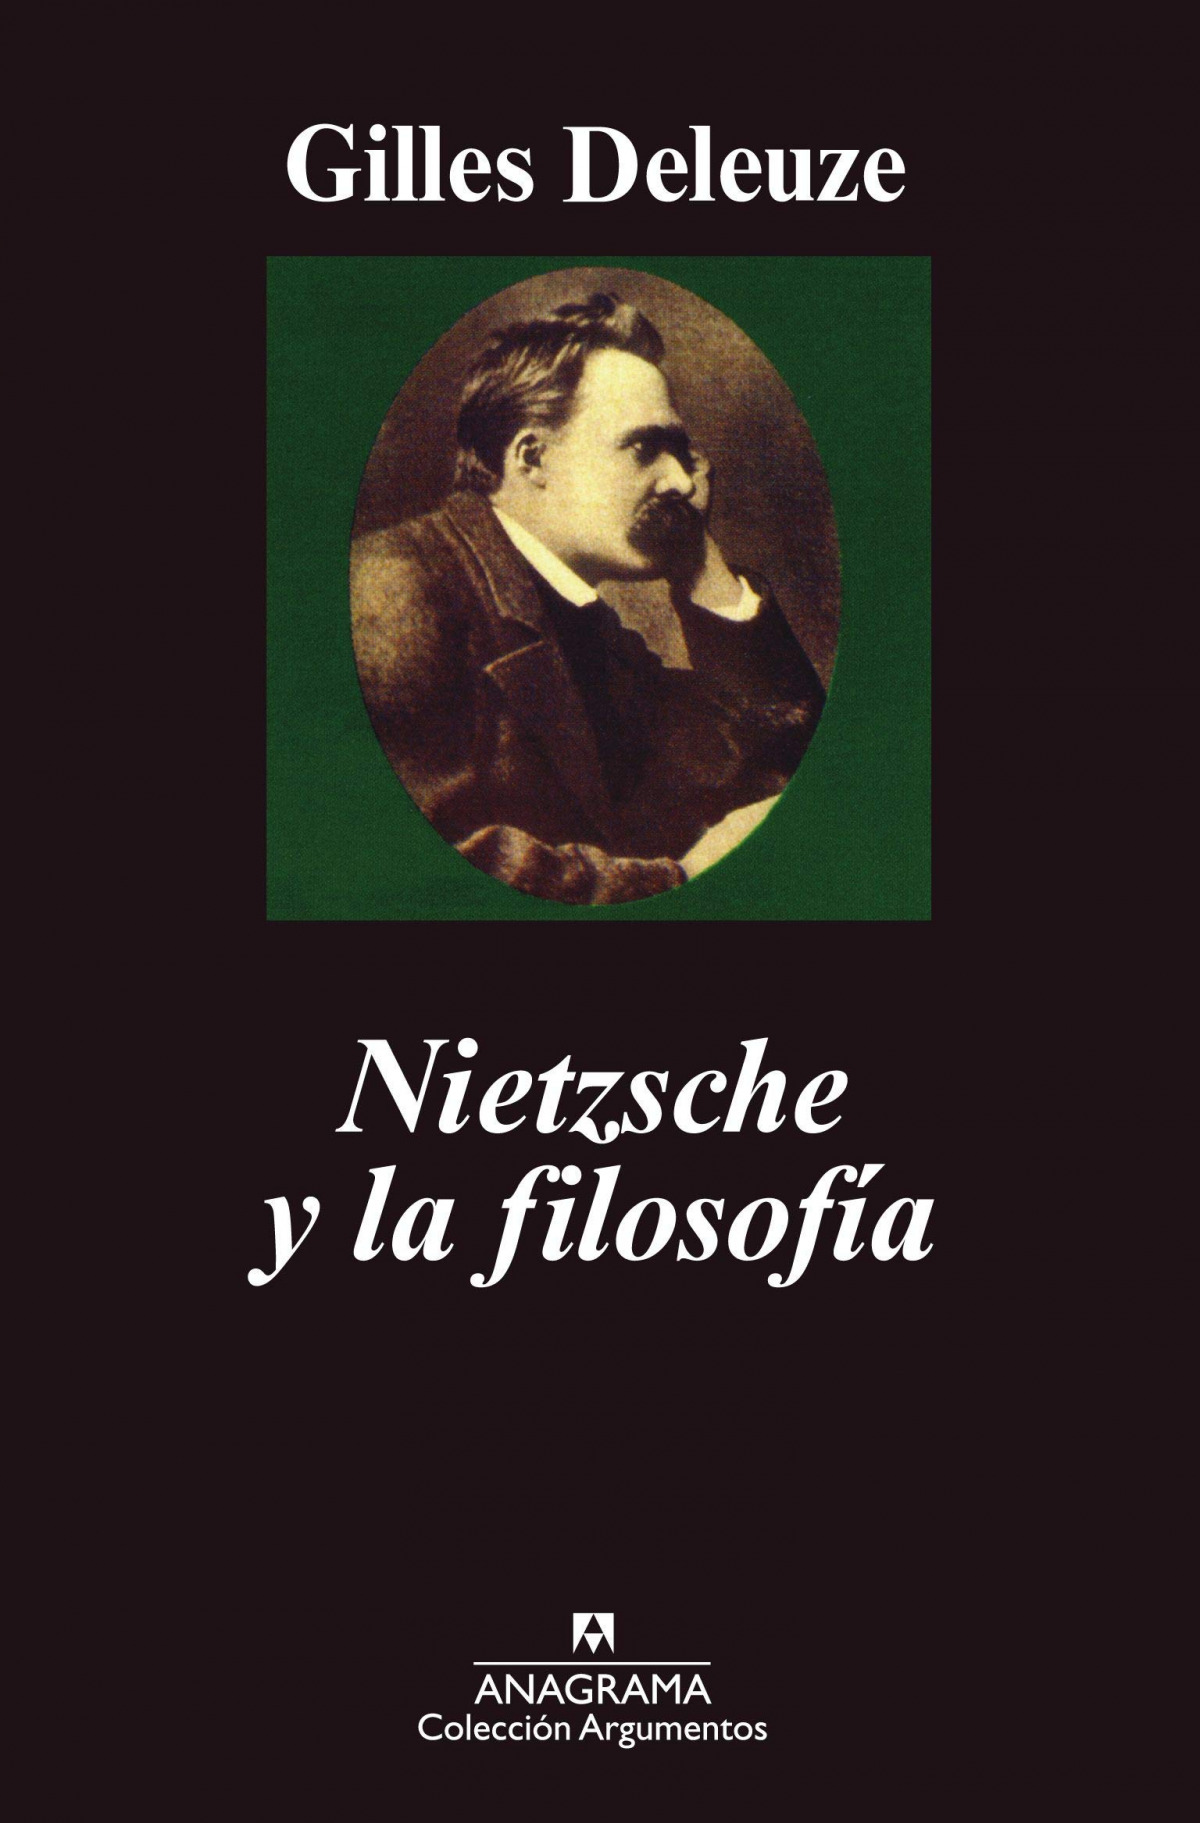 Nietzsche y la filosofia